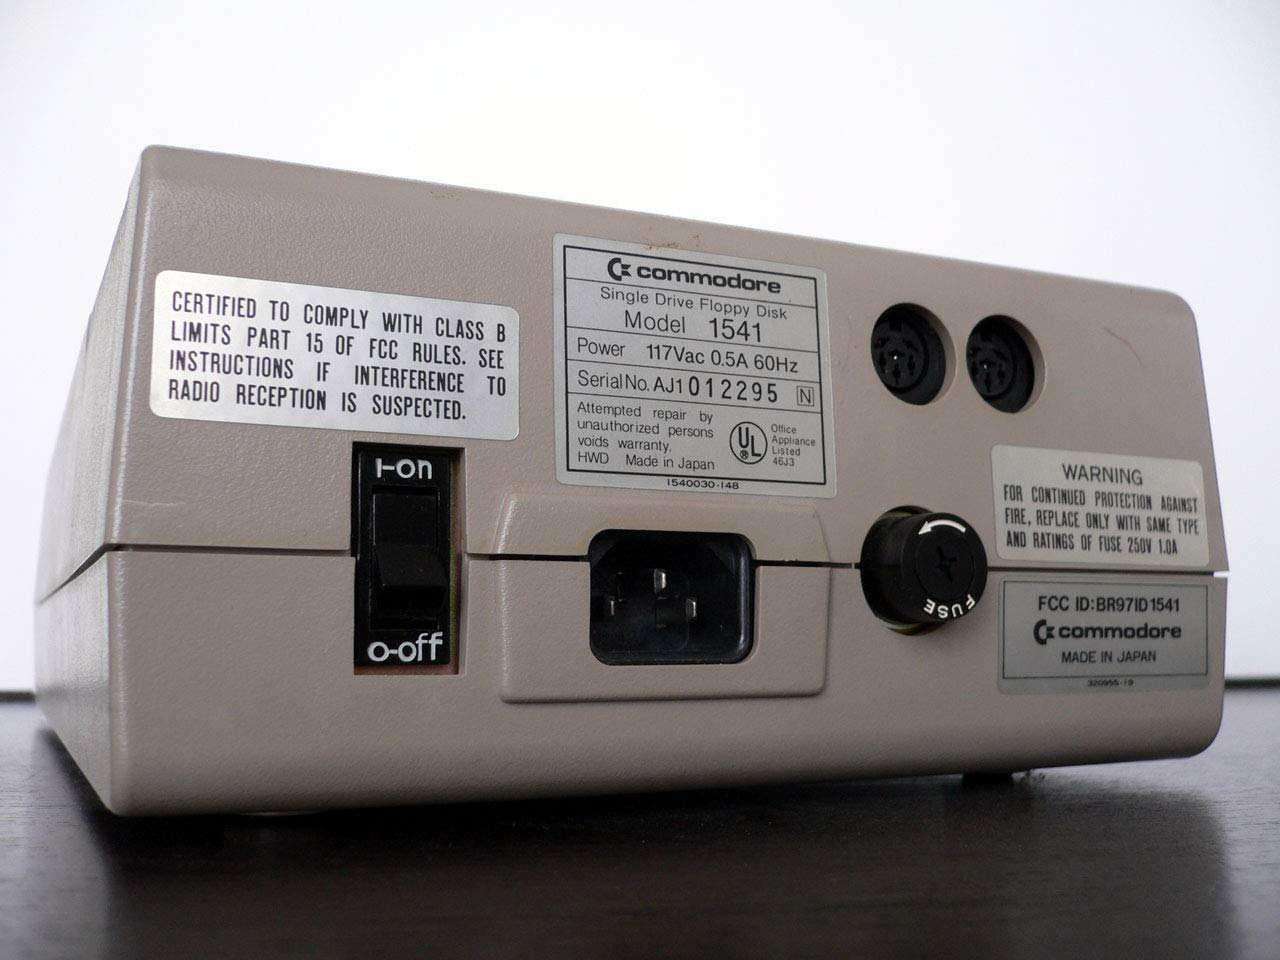 Amazon.com: Commodore 1541 Disk Drive (1541C (Newer C Model Grey)):  Computers & Accessories